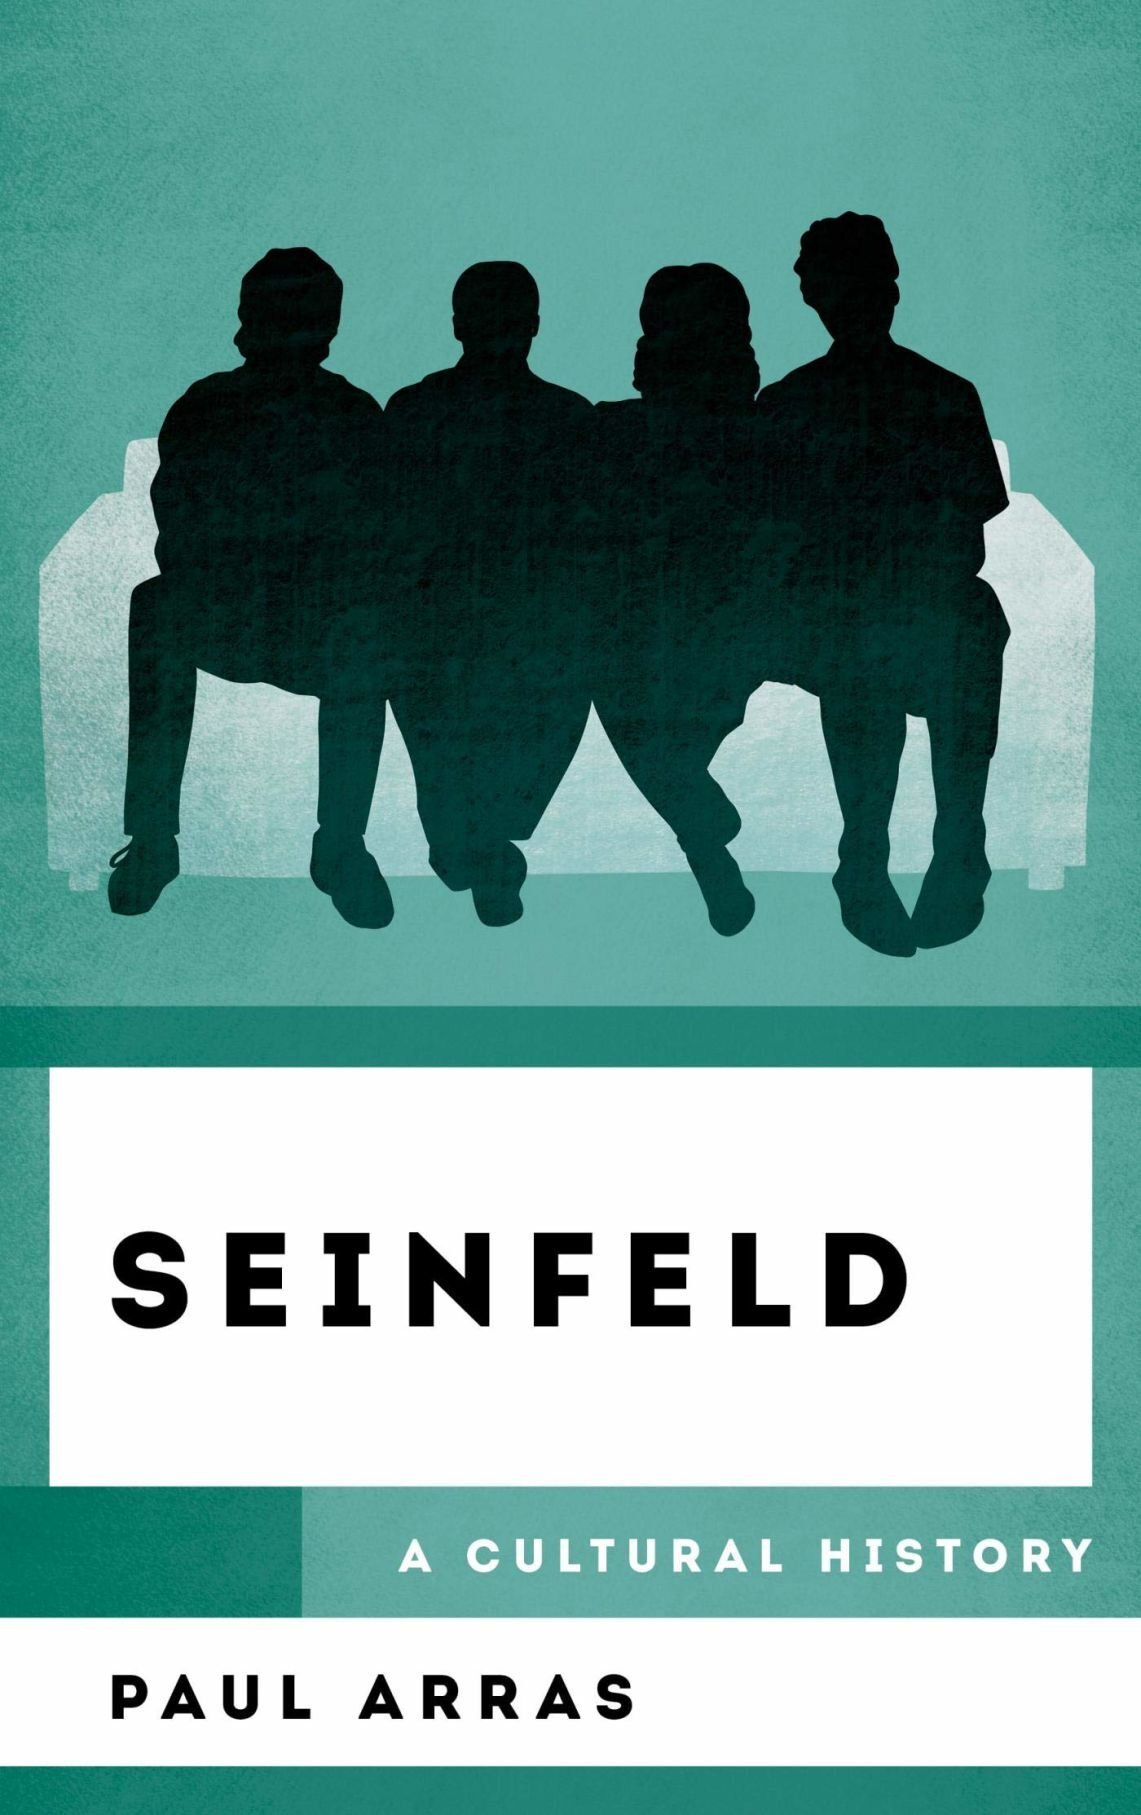 Seinfeld A Cultural History